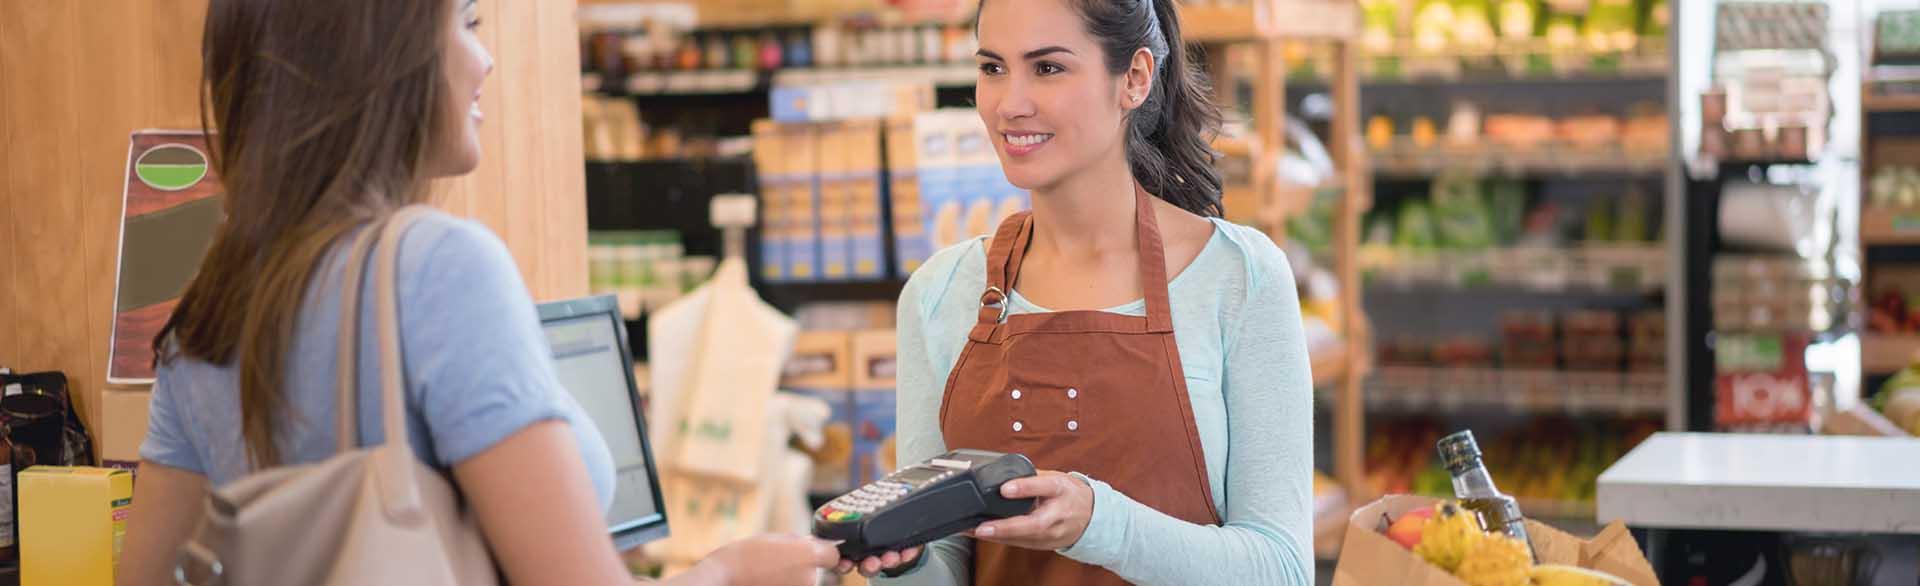 Warenwirtschaft ERP-System SAp Business One